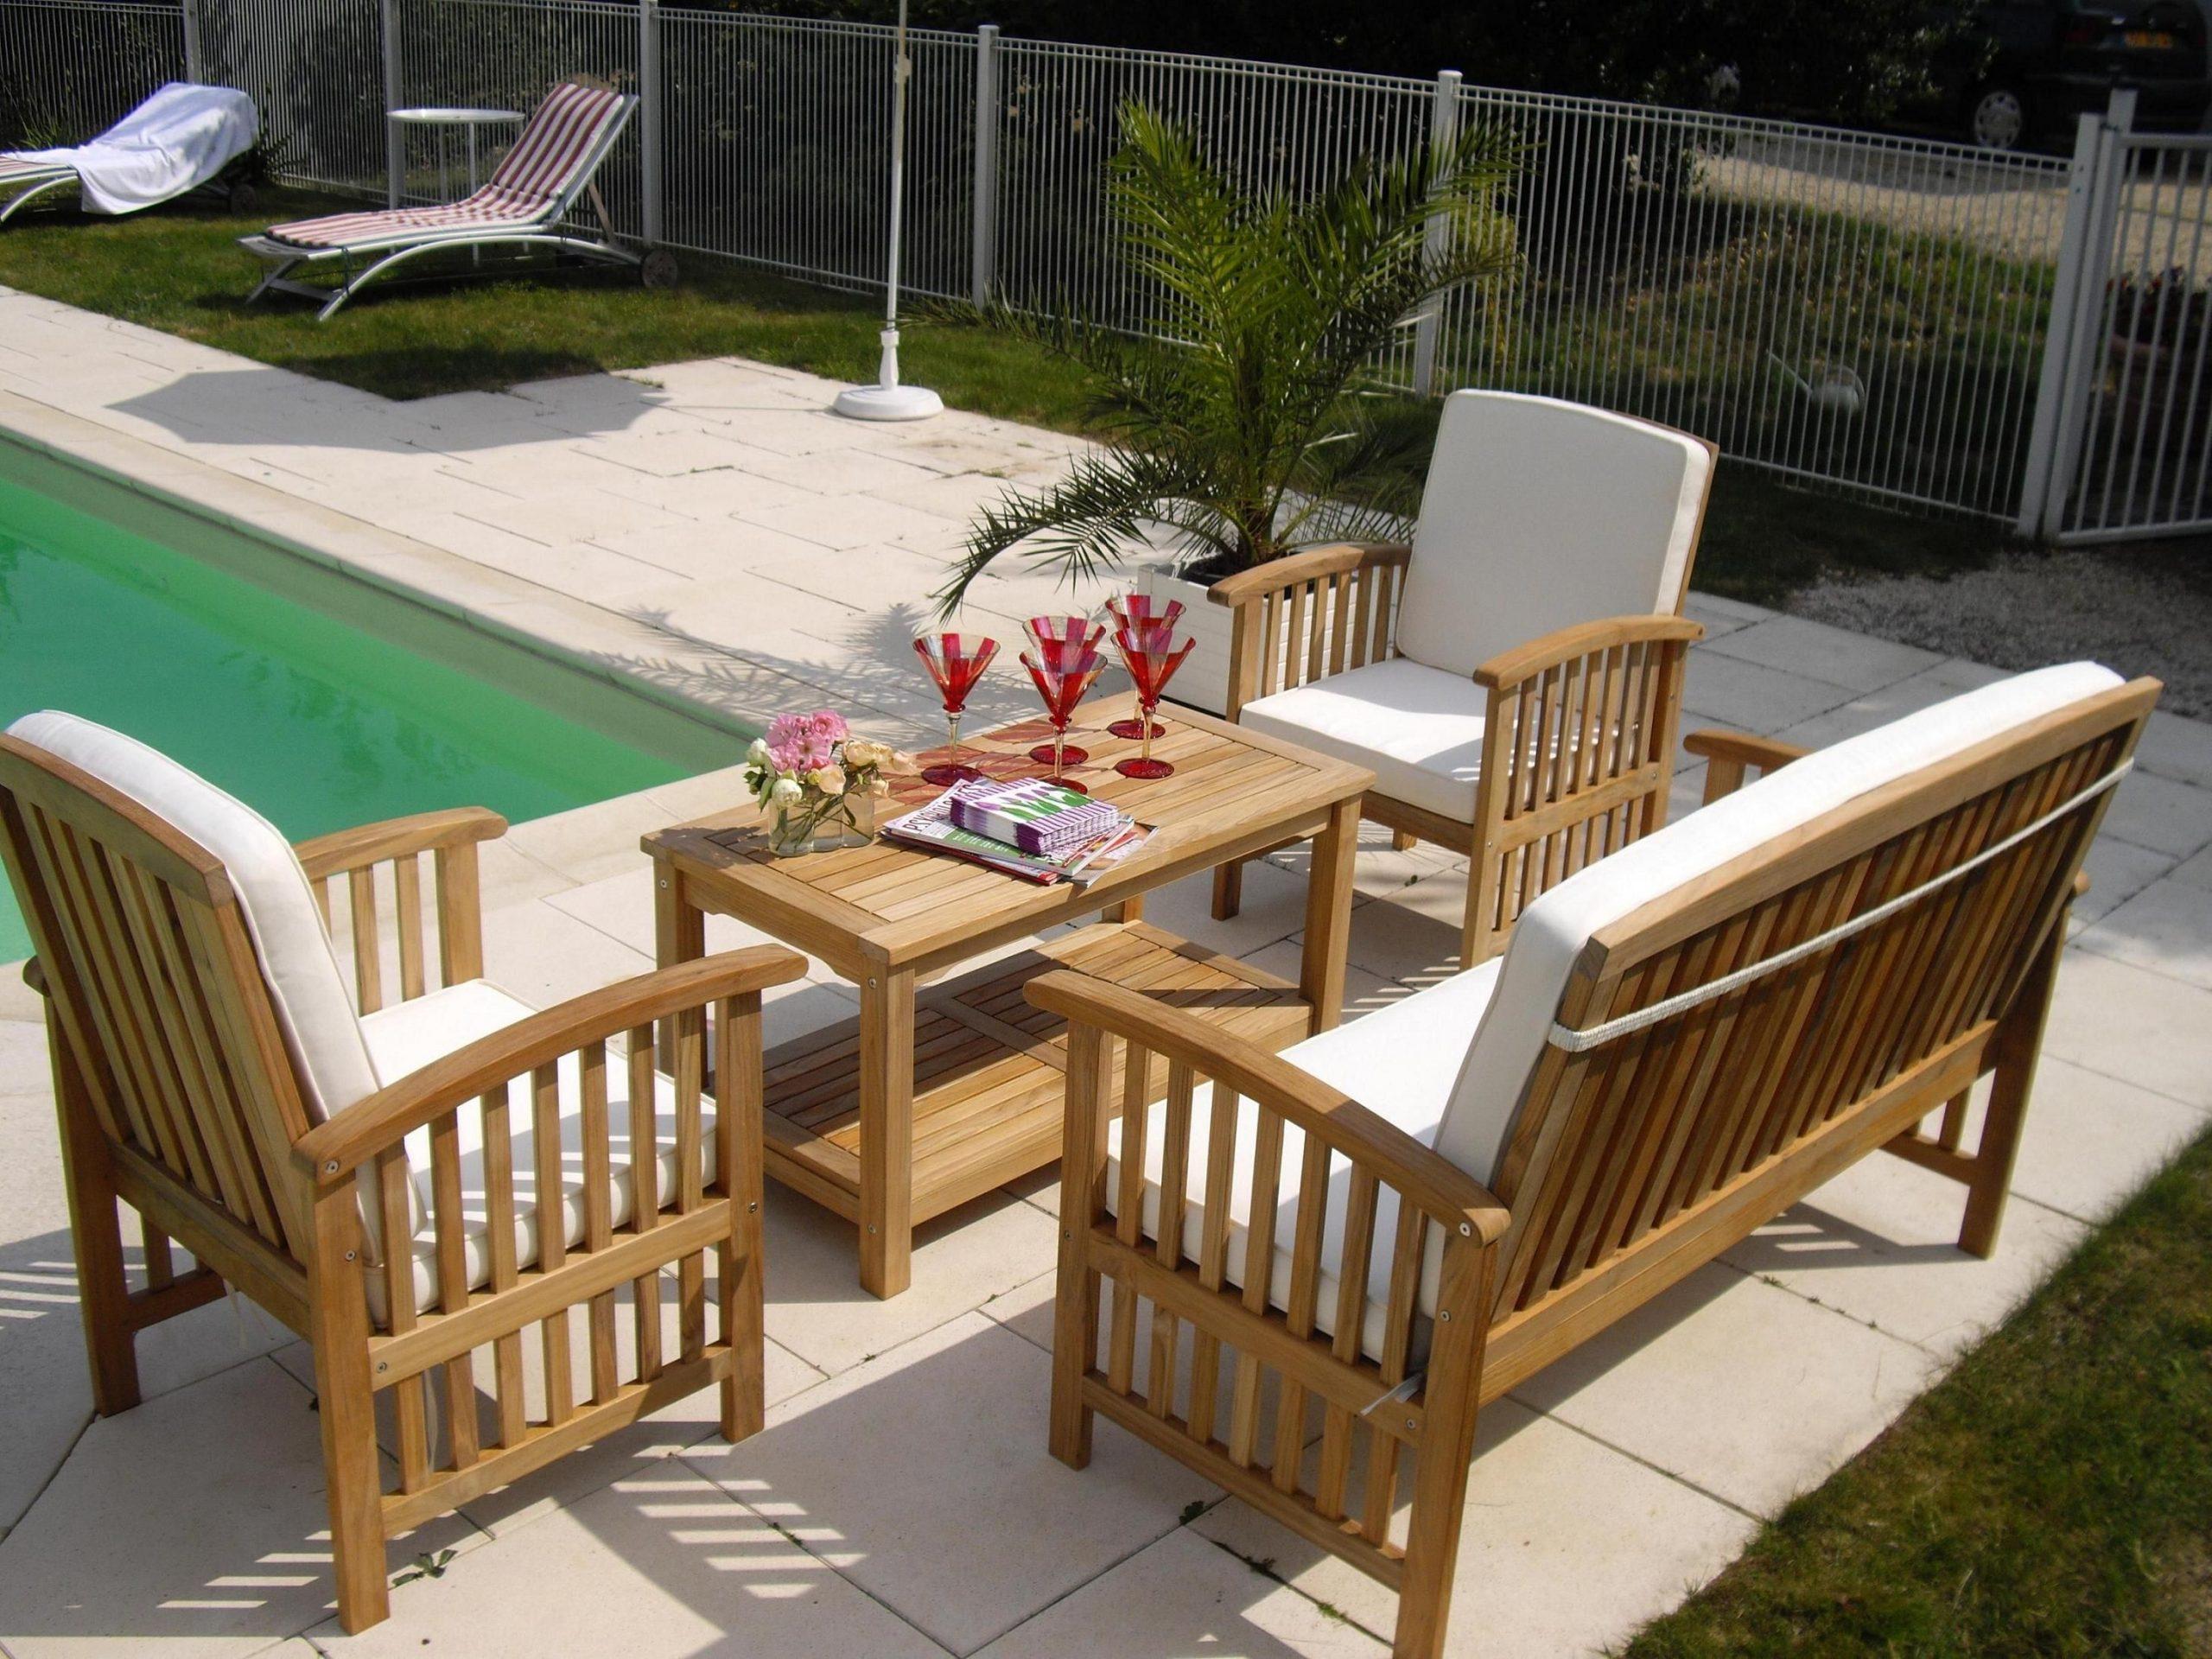 Impressionnant Salon De Jardin En Teck En Promotion | Salon ... pour Salon De Jardin En Promotion